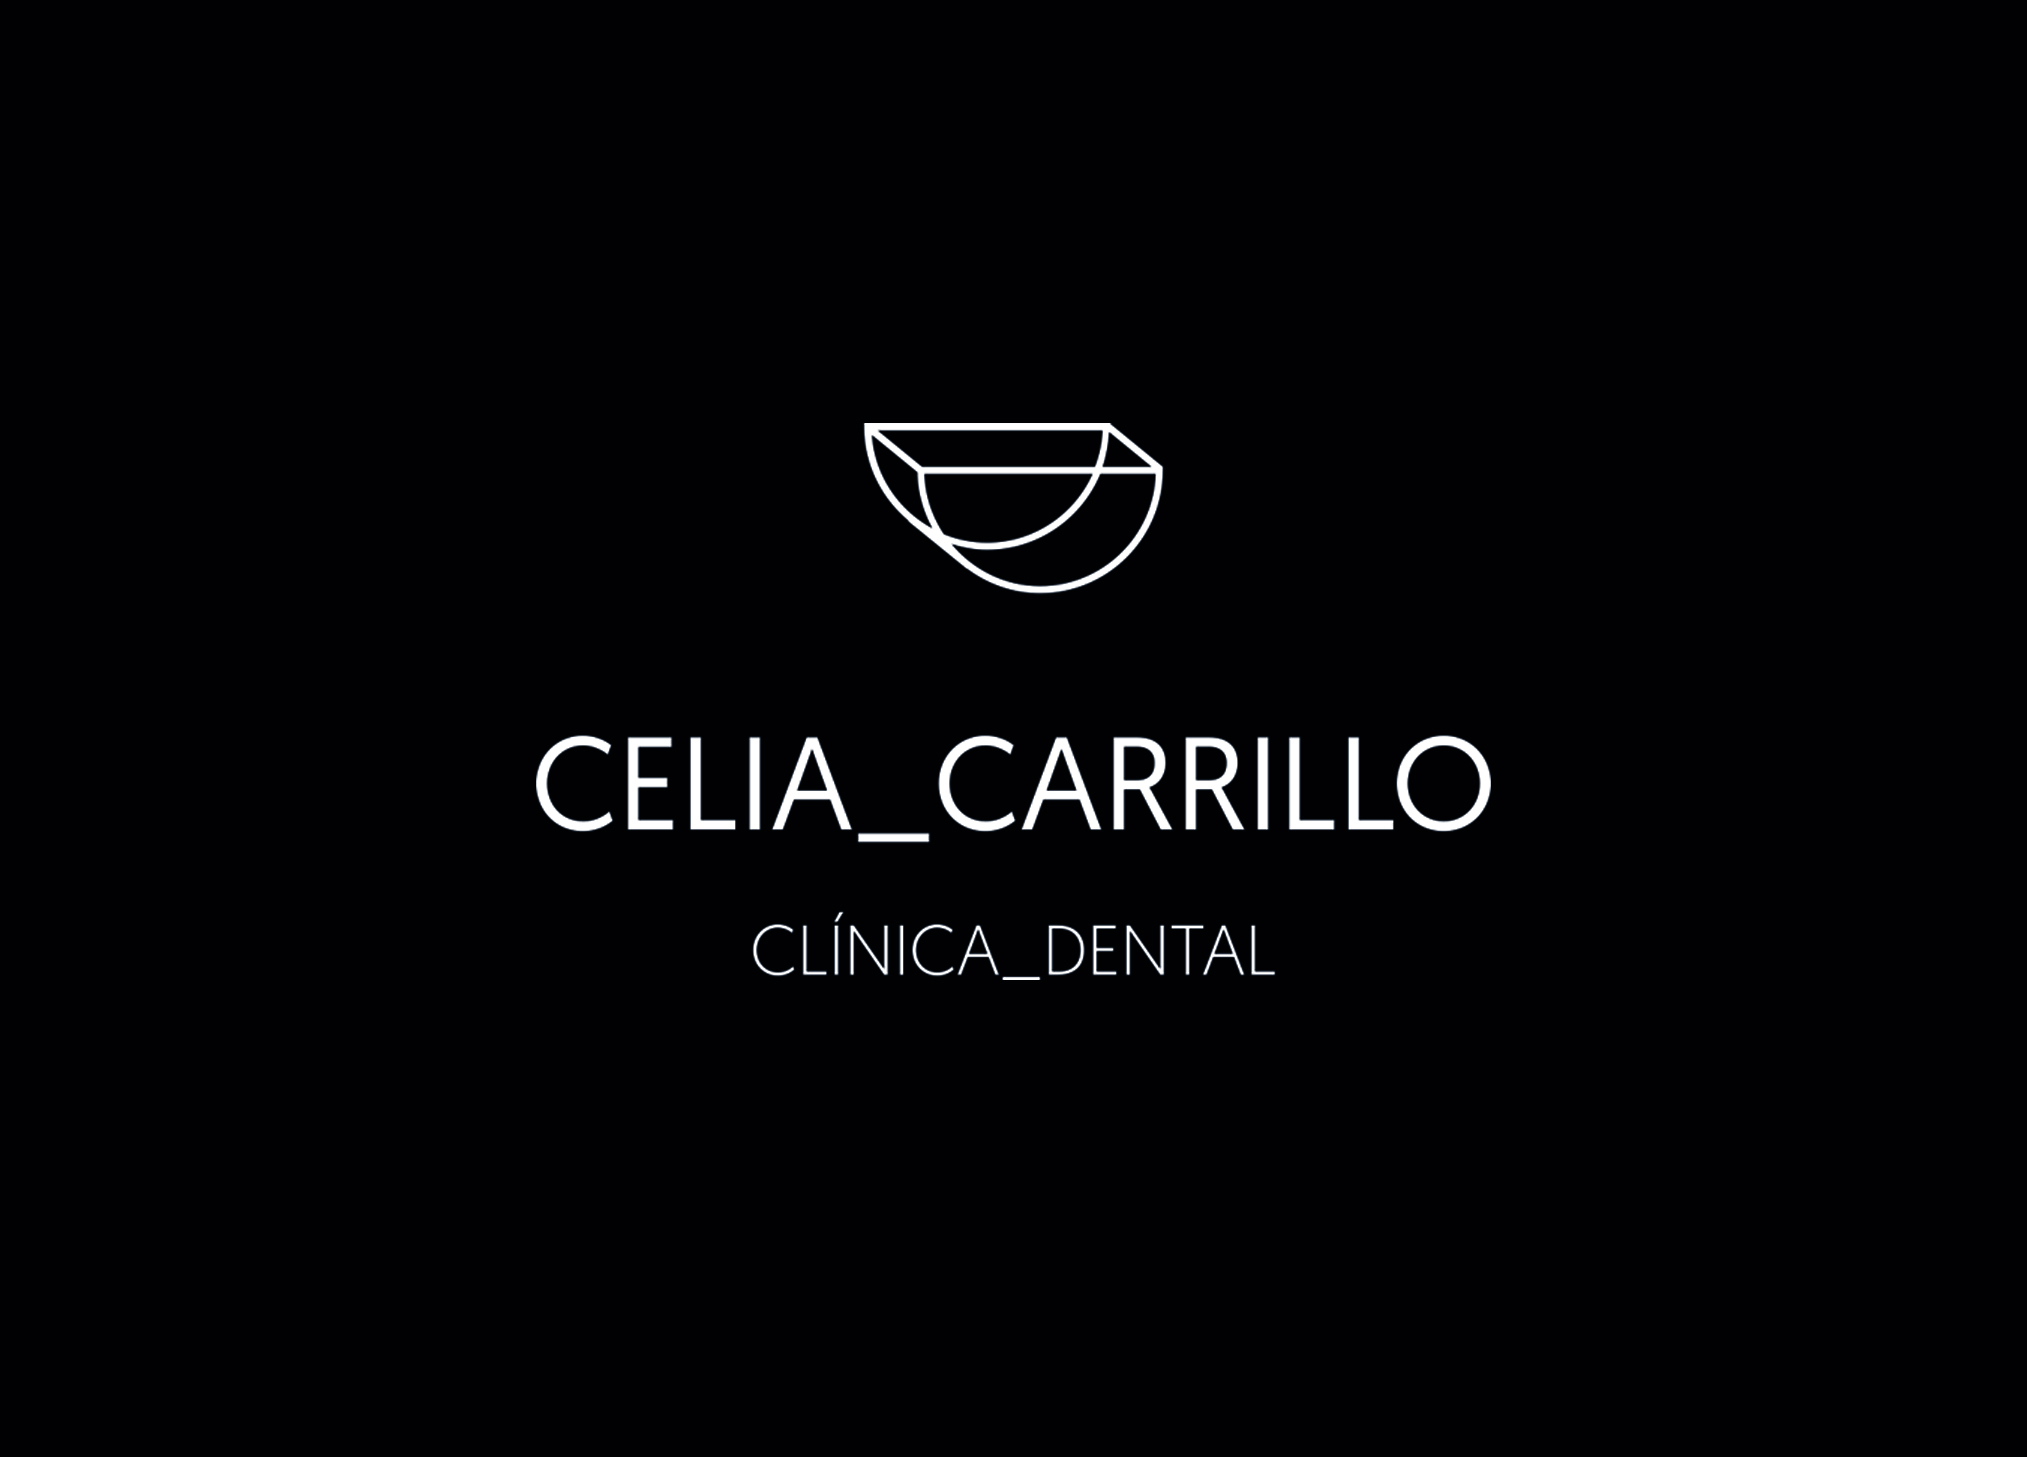 CELIA_CARRILLO CLÍNICA_DENTAL by CREATIAS ESTUDIO - Creative Work